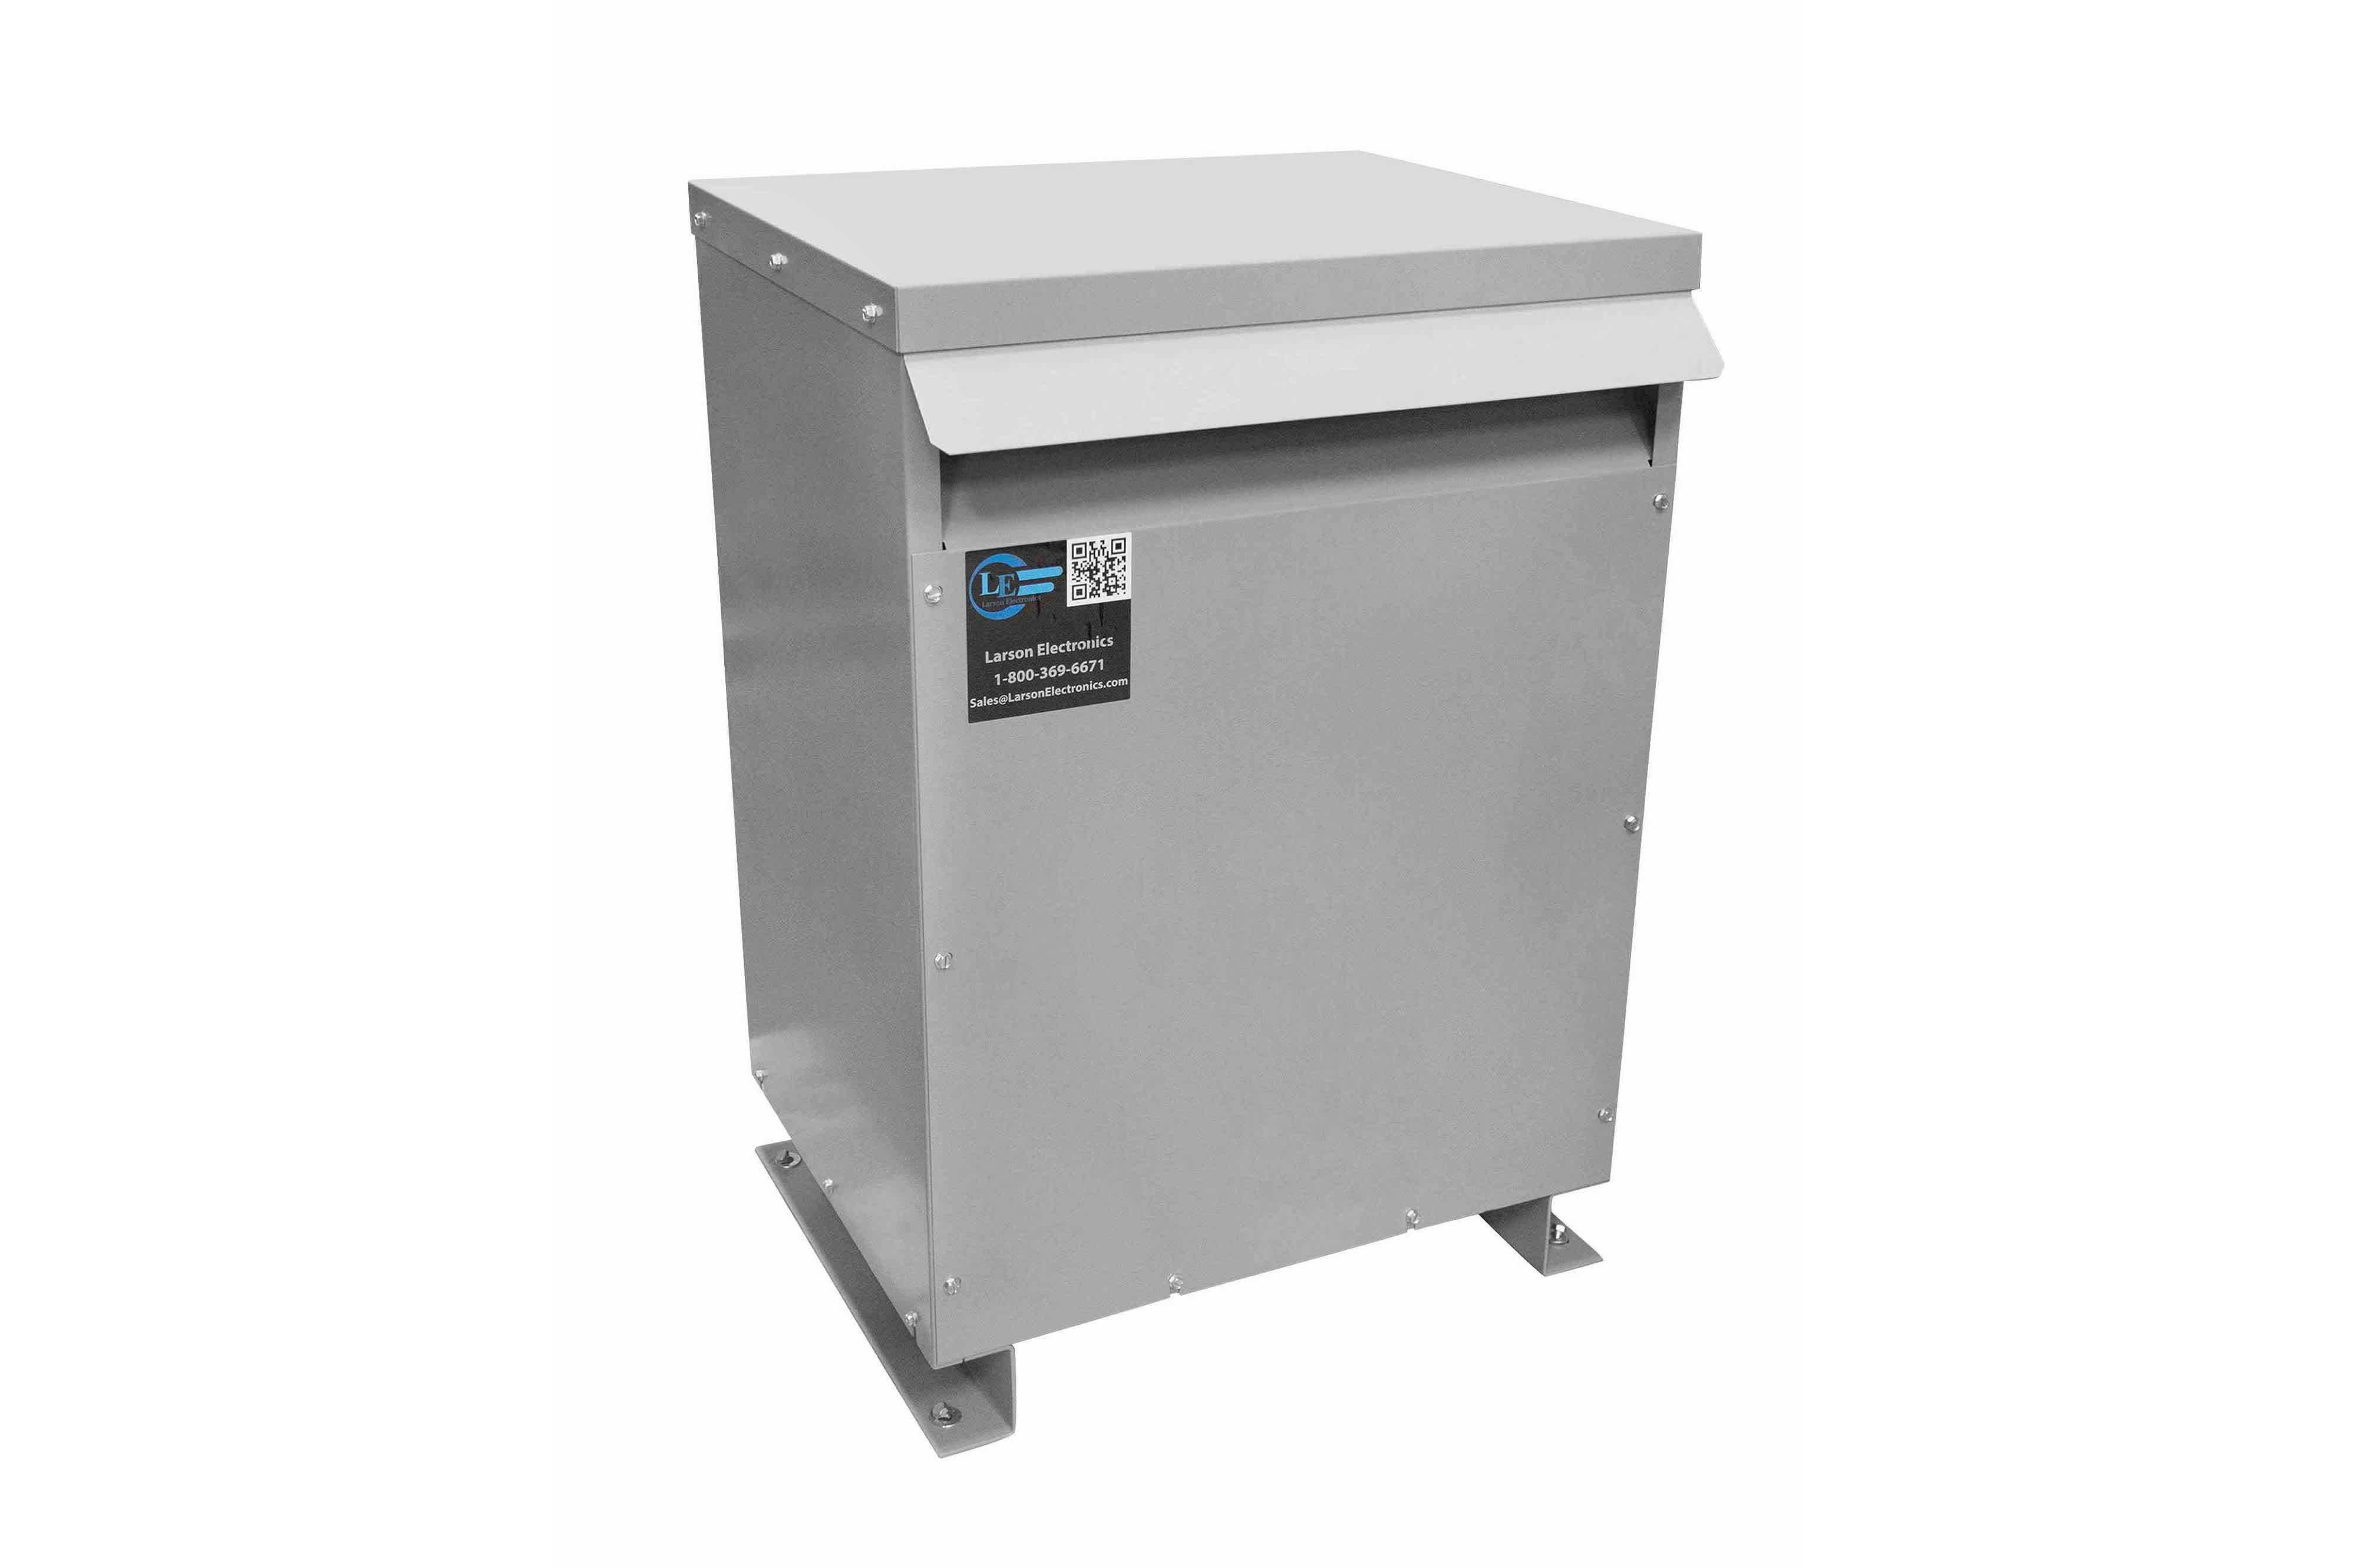 137.5 kVA 3PH Isolation Transformer, 460V Wye Primary, 600V Delta Secondary, N3R, Ventilated, 60 Hz